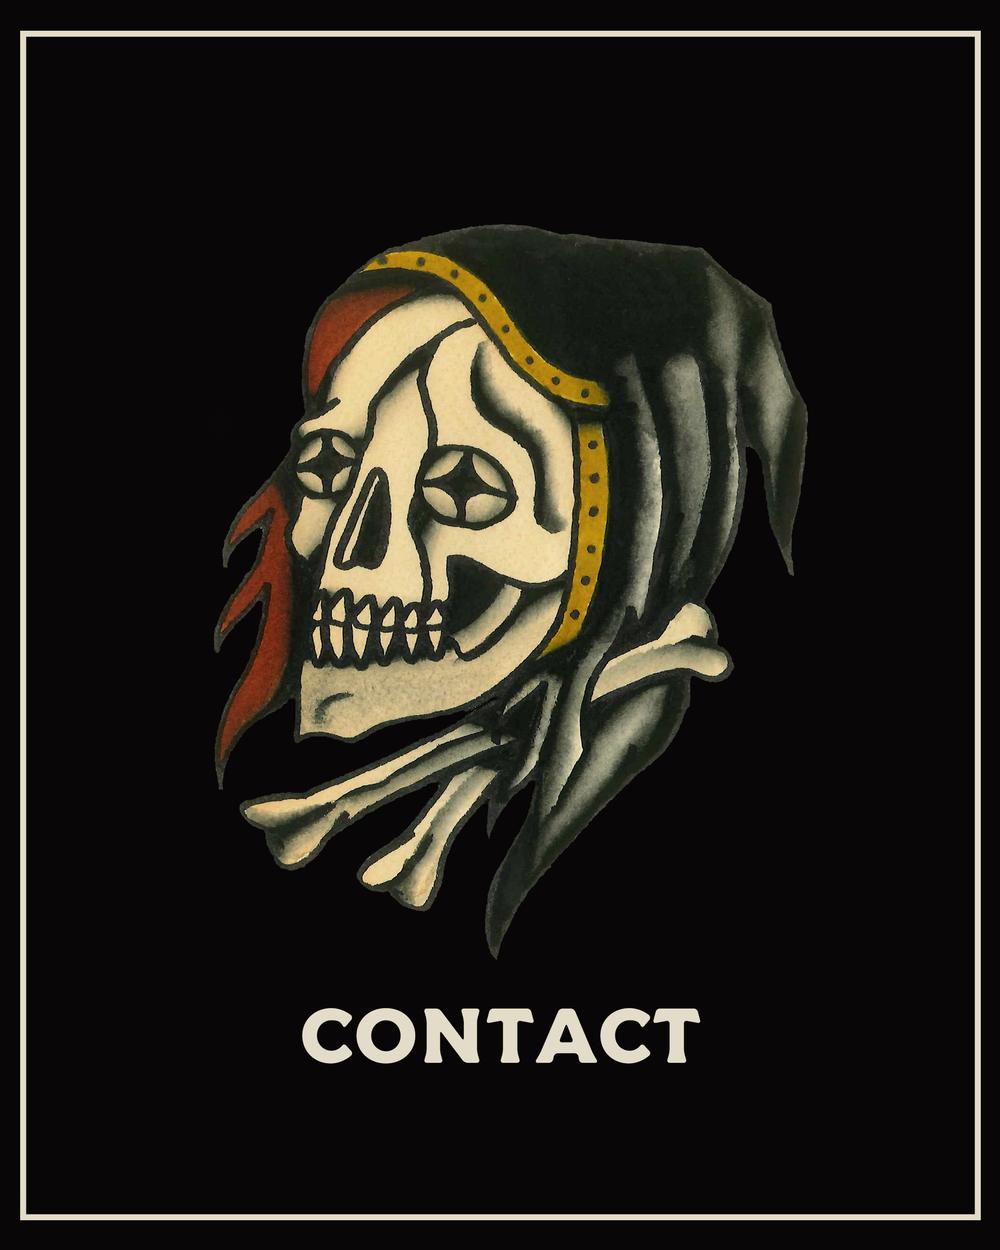 11112222 contact border.png